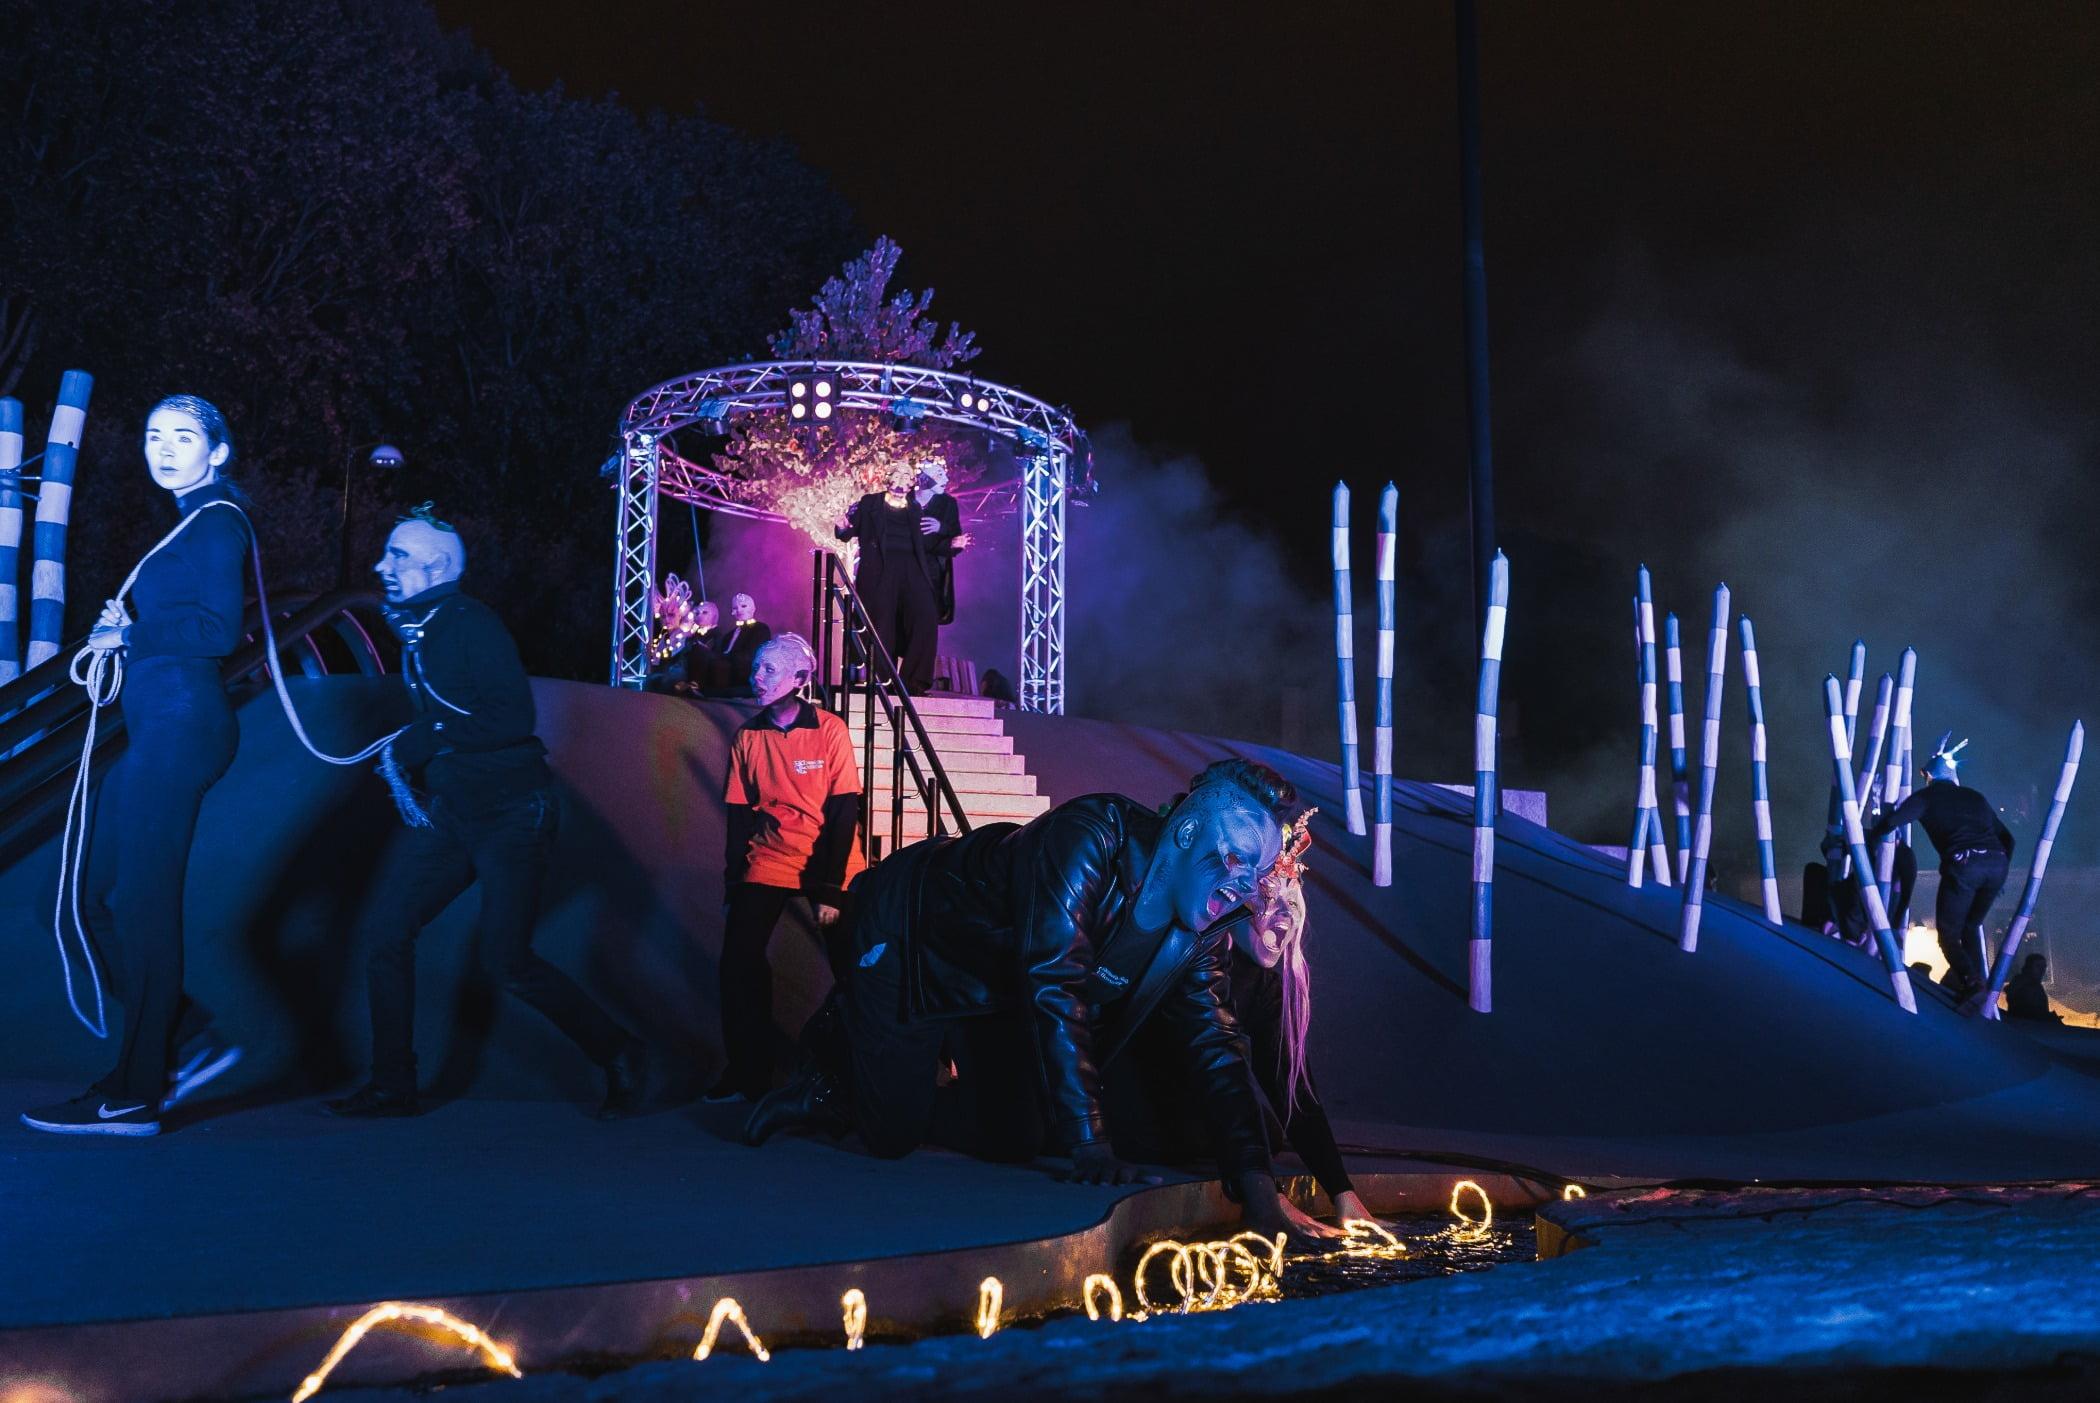 Majorelle blue, Music venue, Darkness, Stage